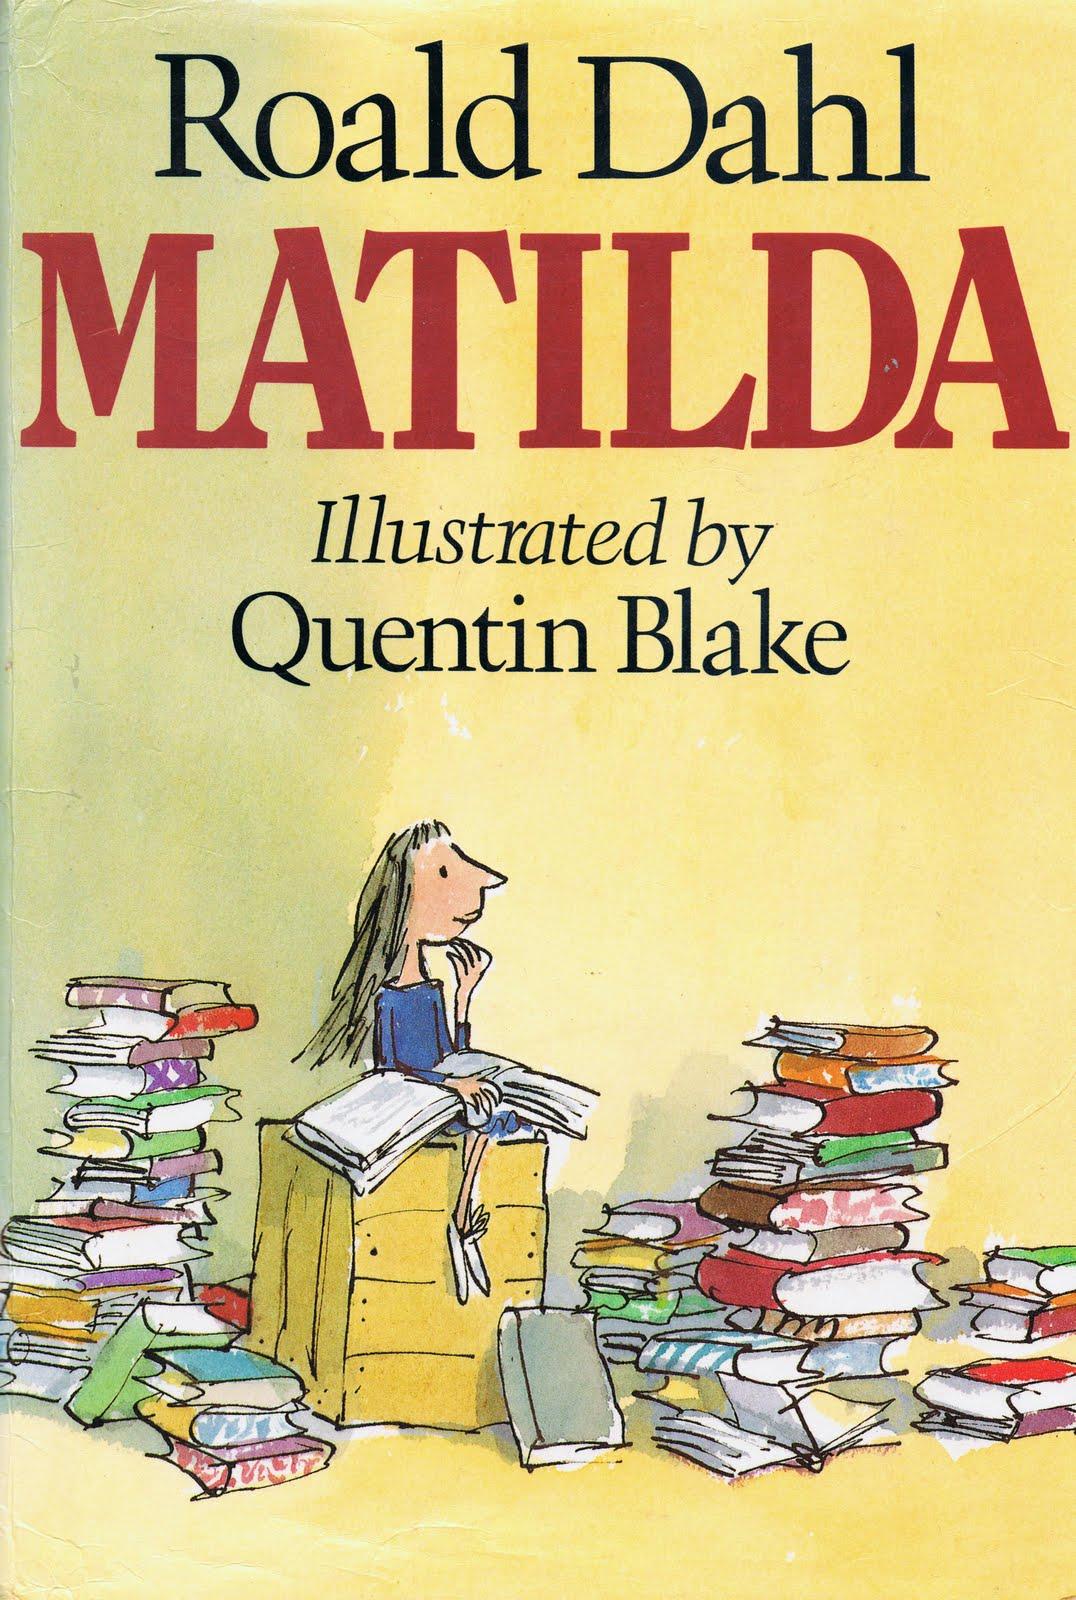 http://images.wikia.com/roalddahl/images/b/b5/Matilda.jpg